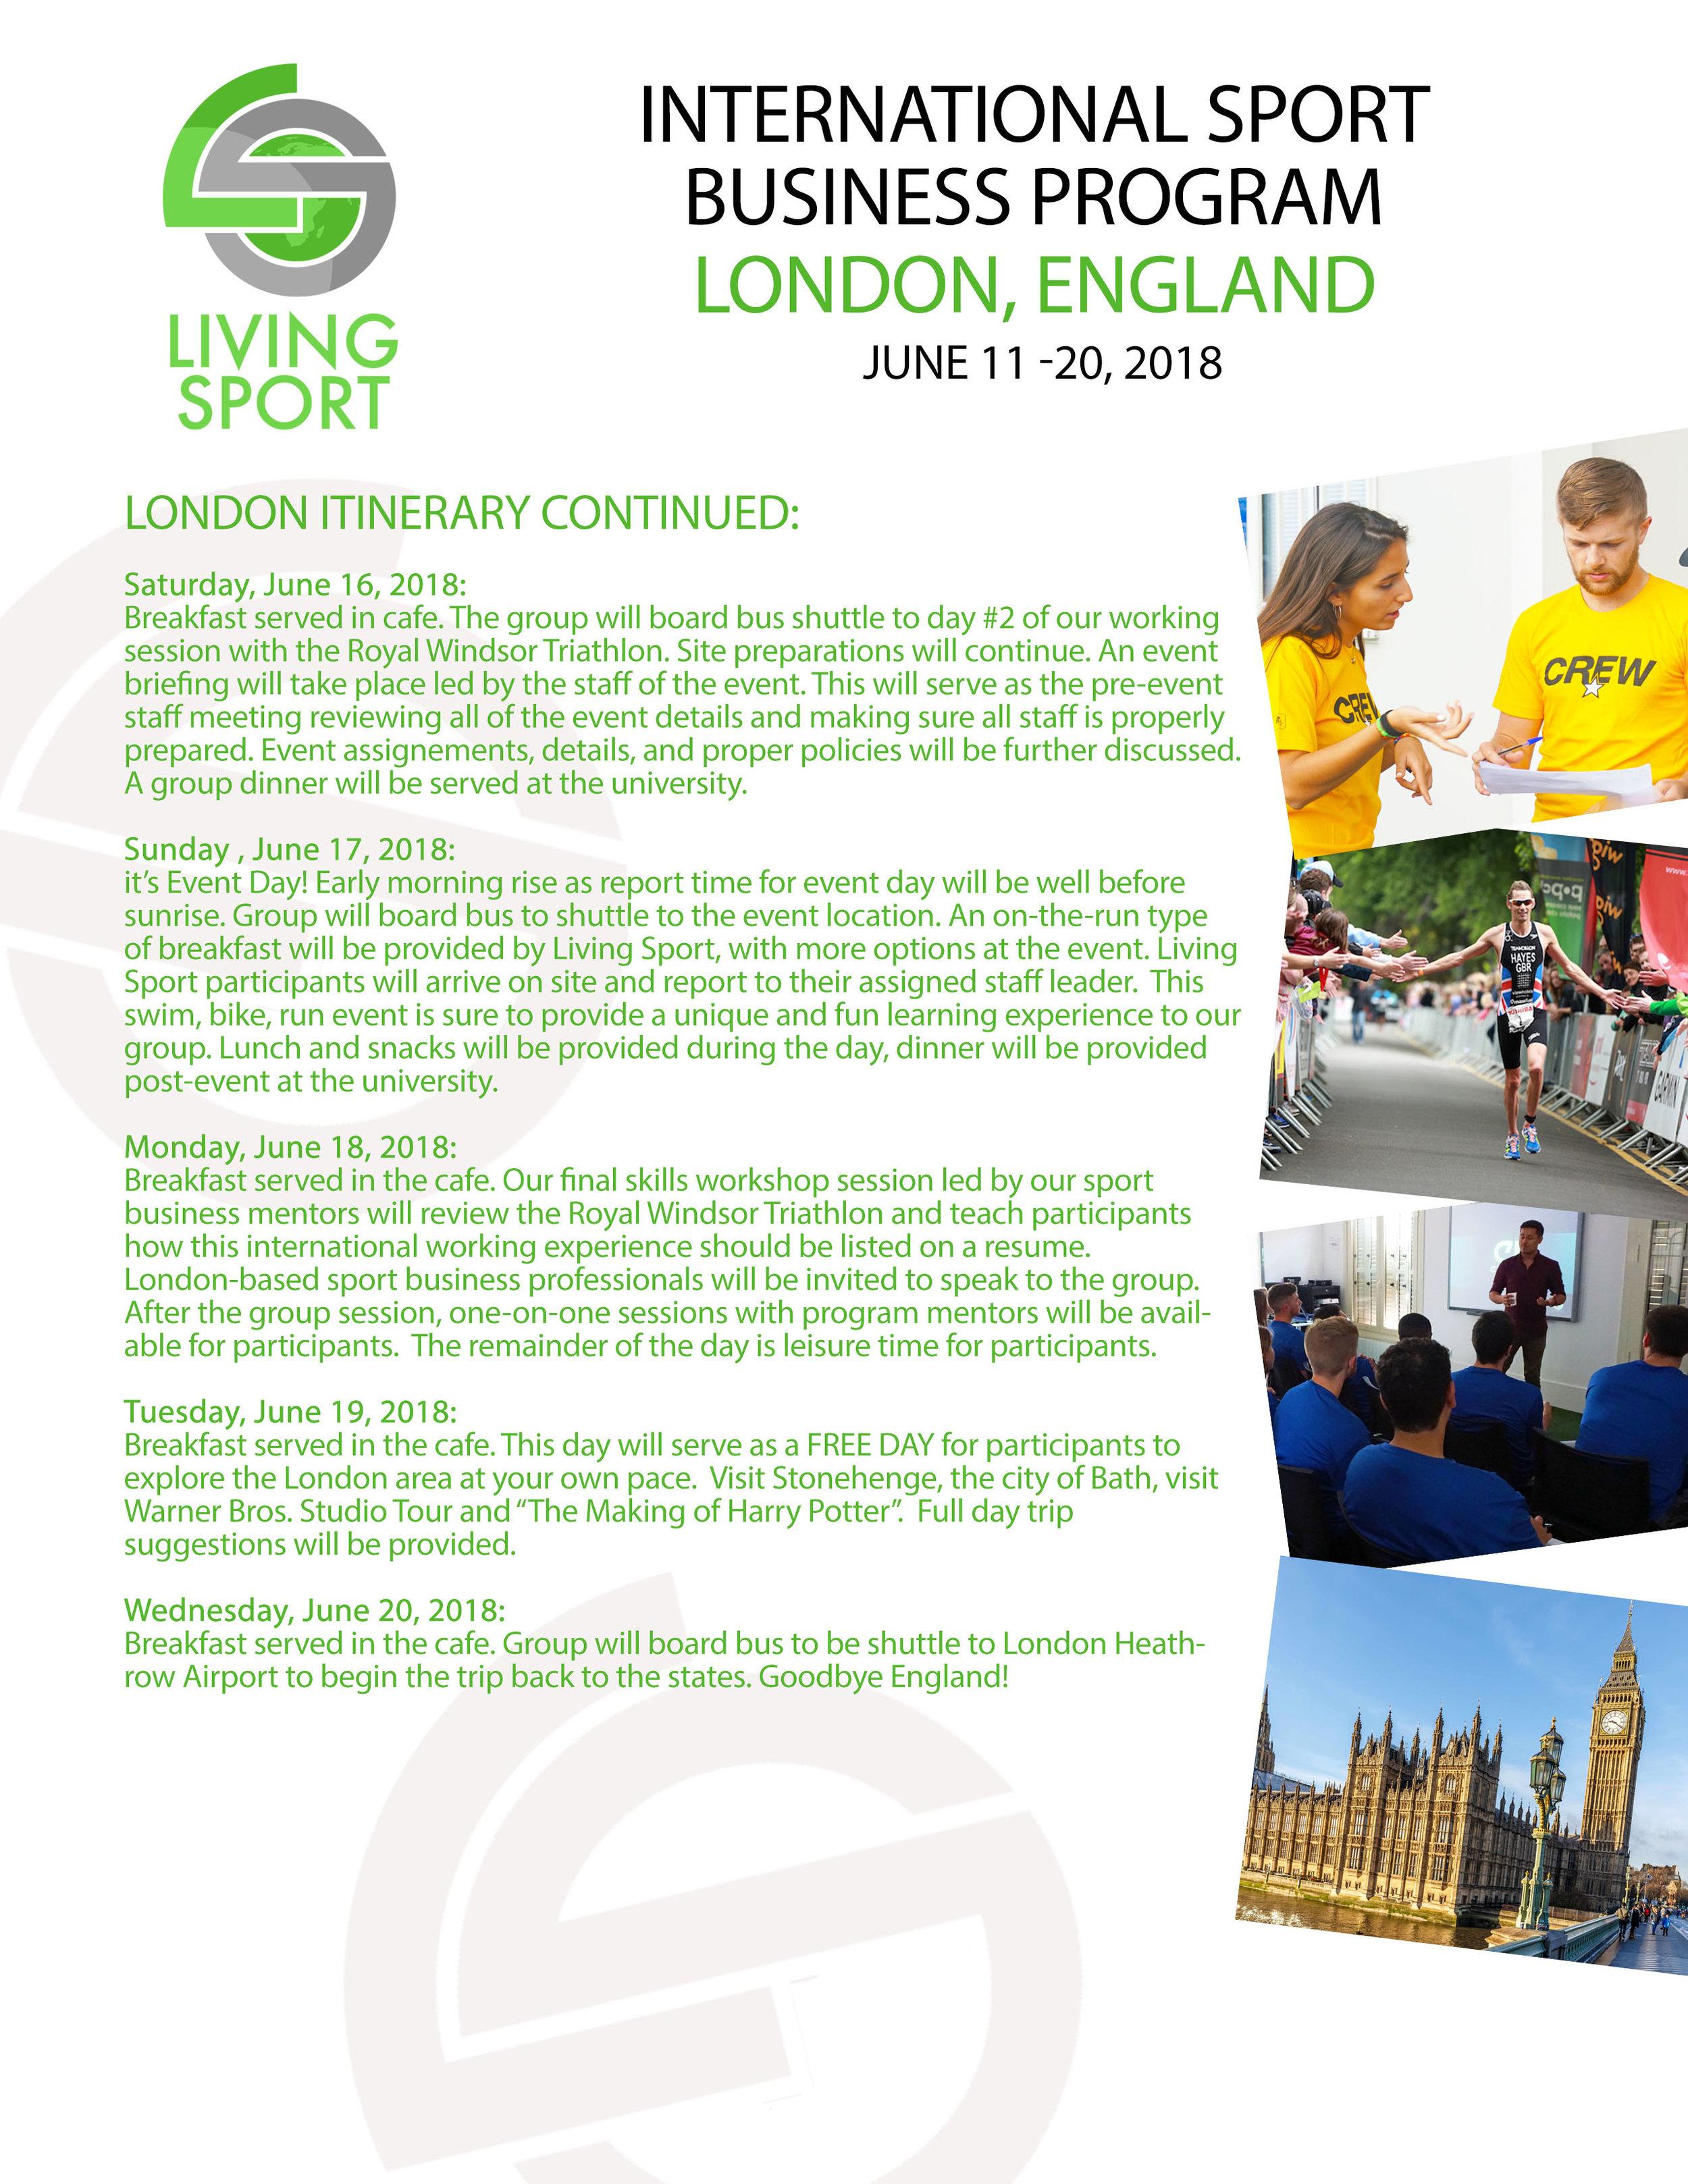 Living Sport Itinerary p2 - London 2018.jpg